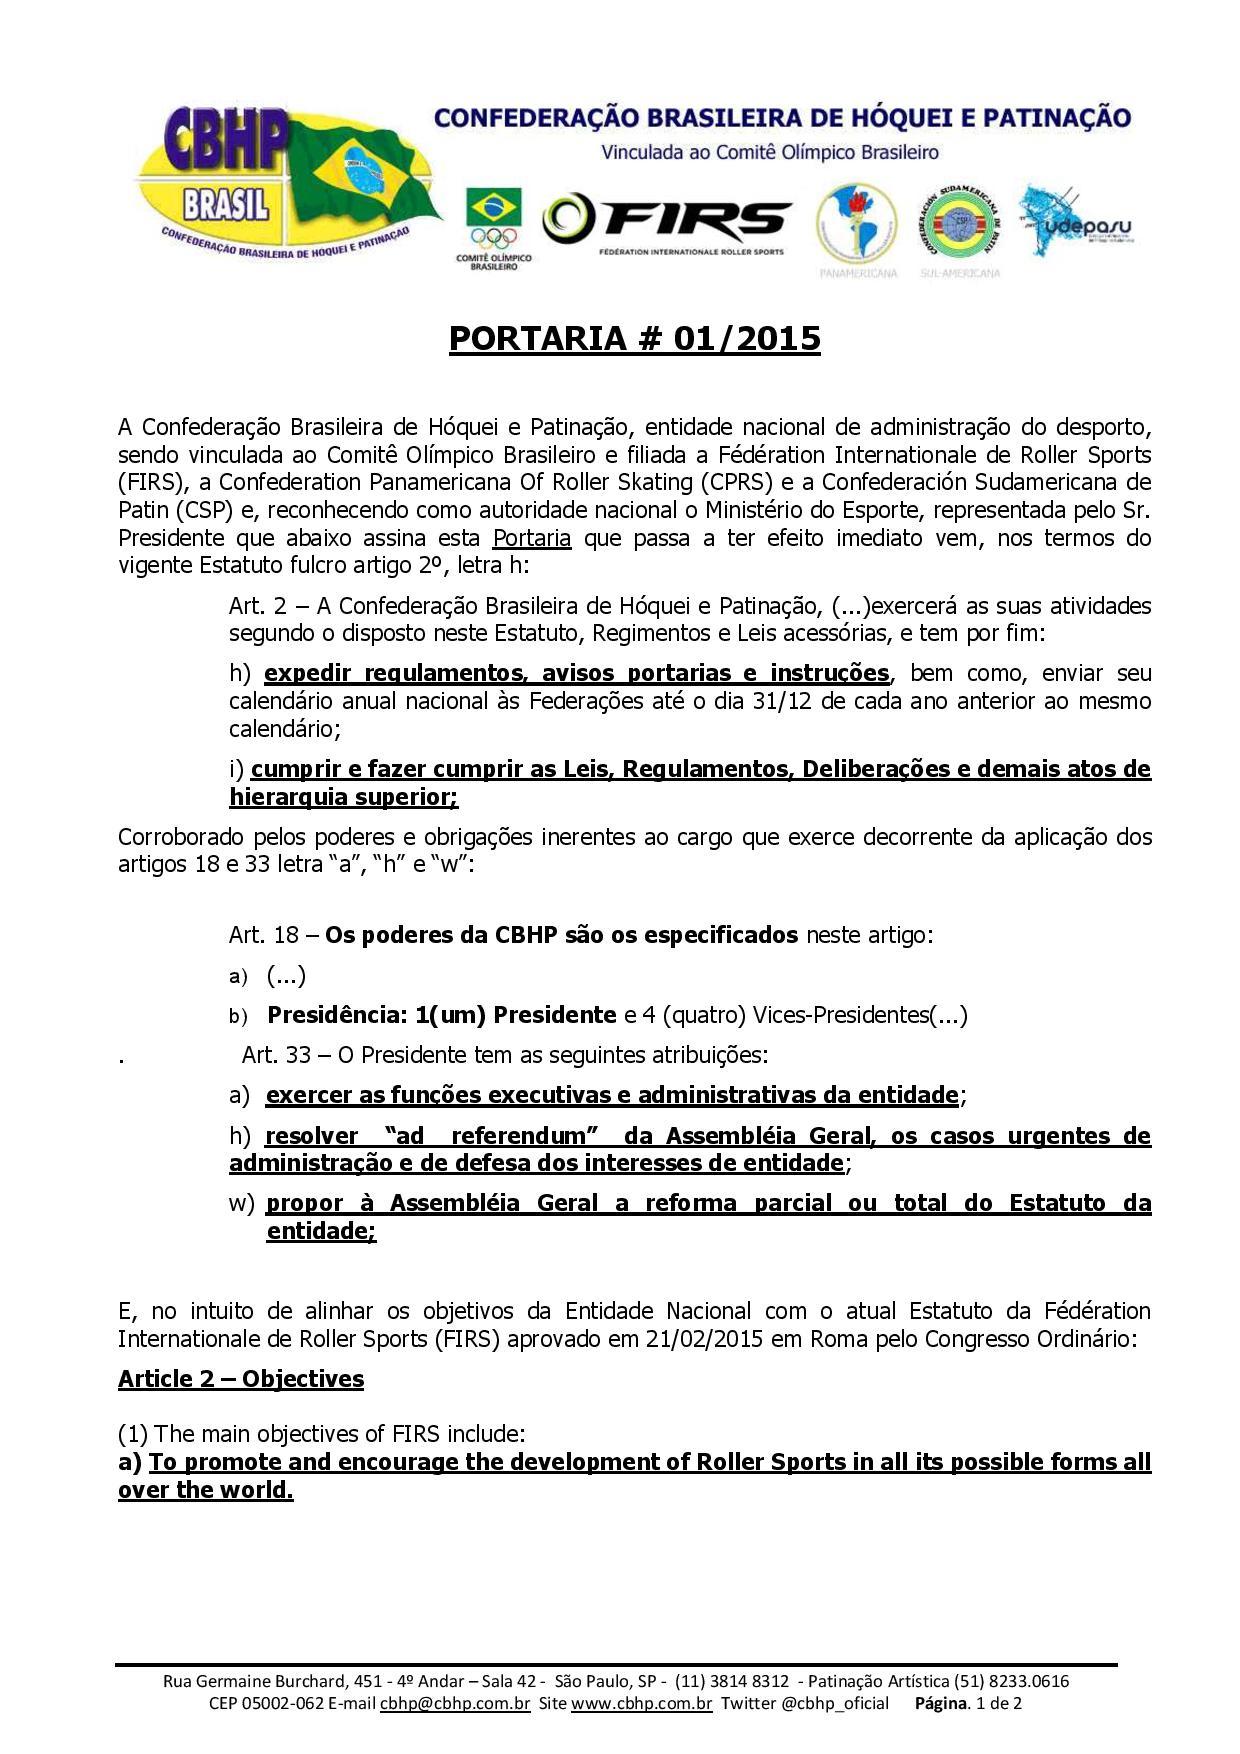 Portaria-01-2015-page-001